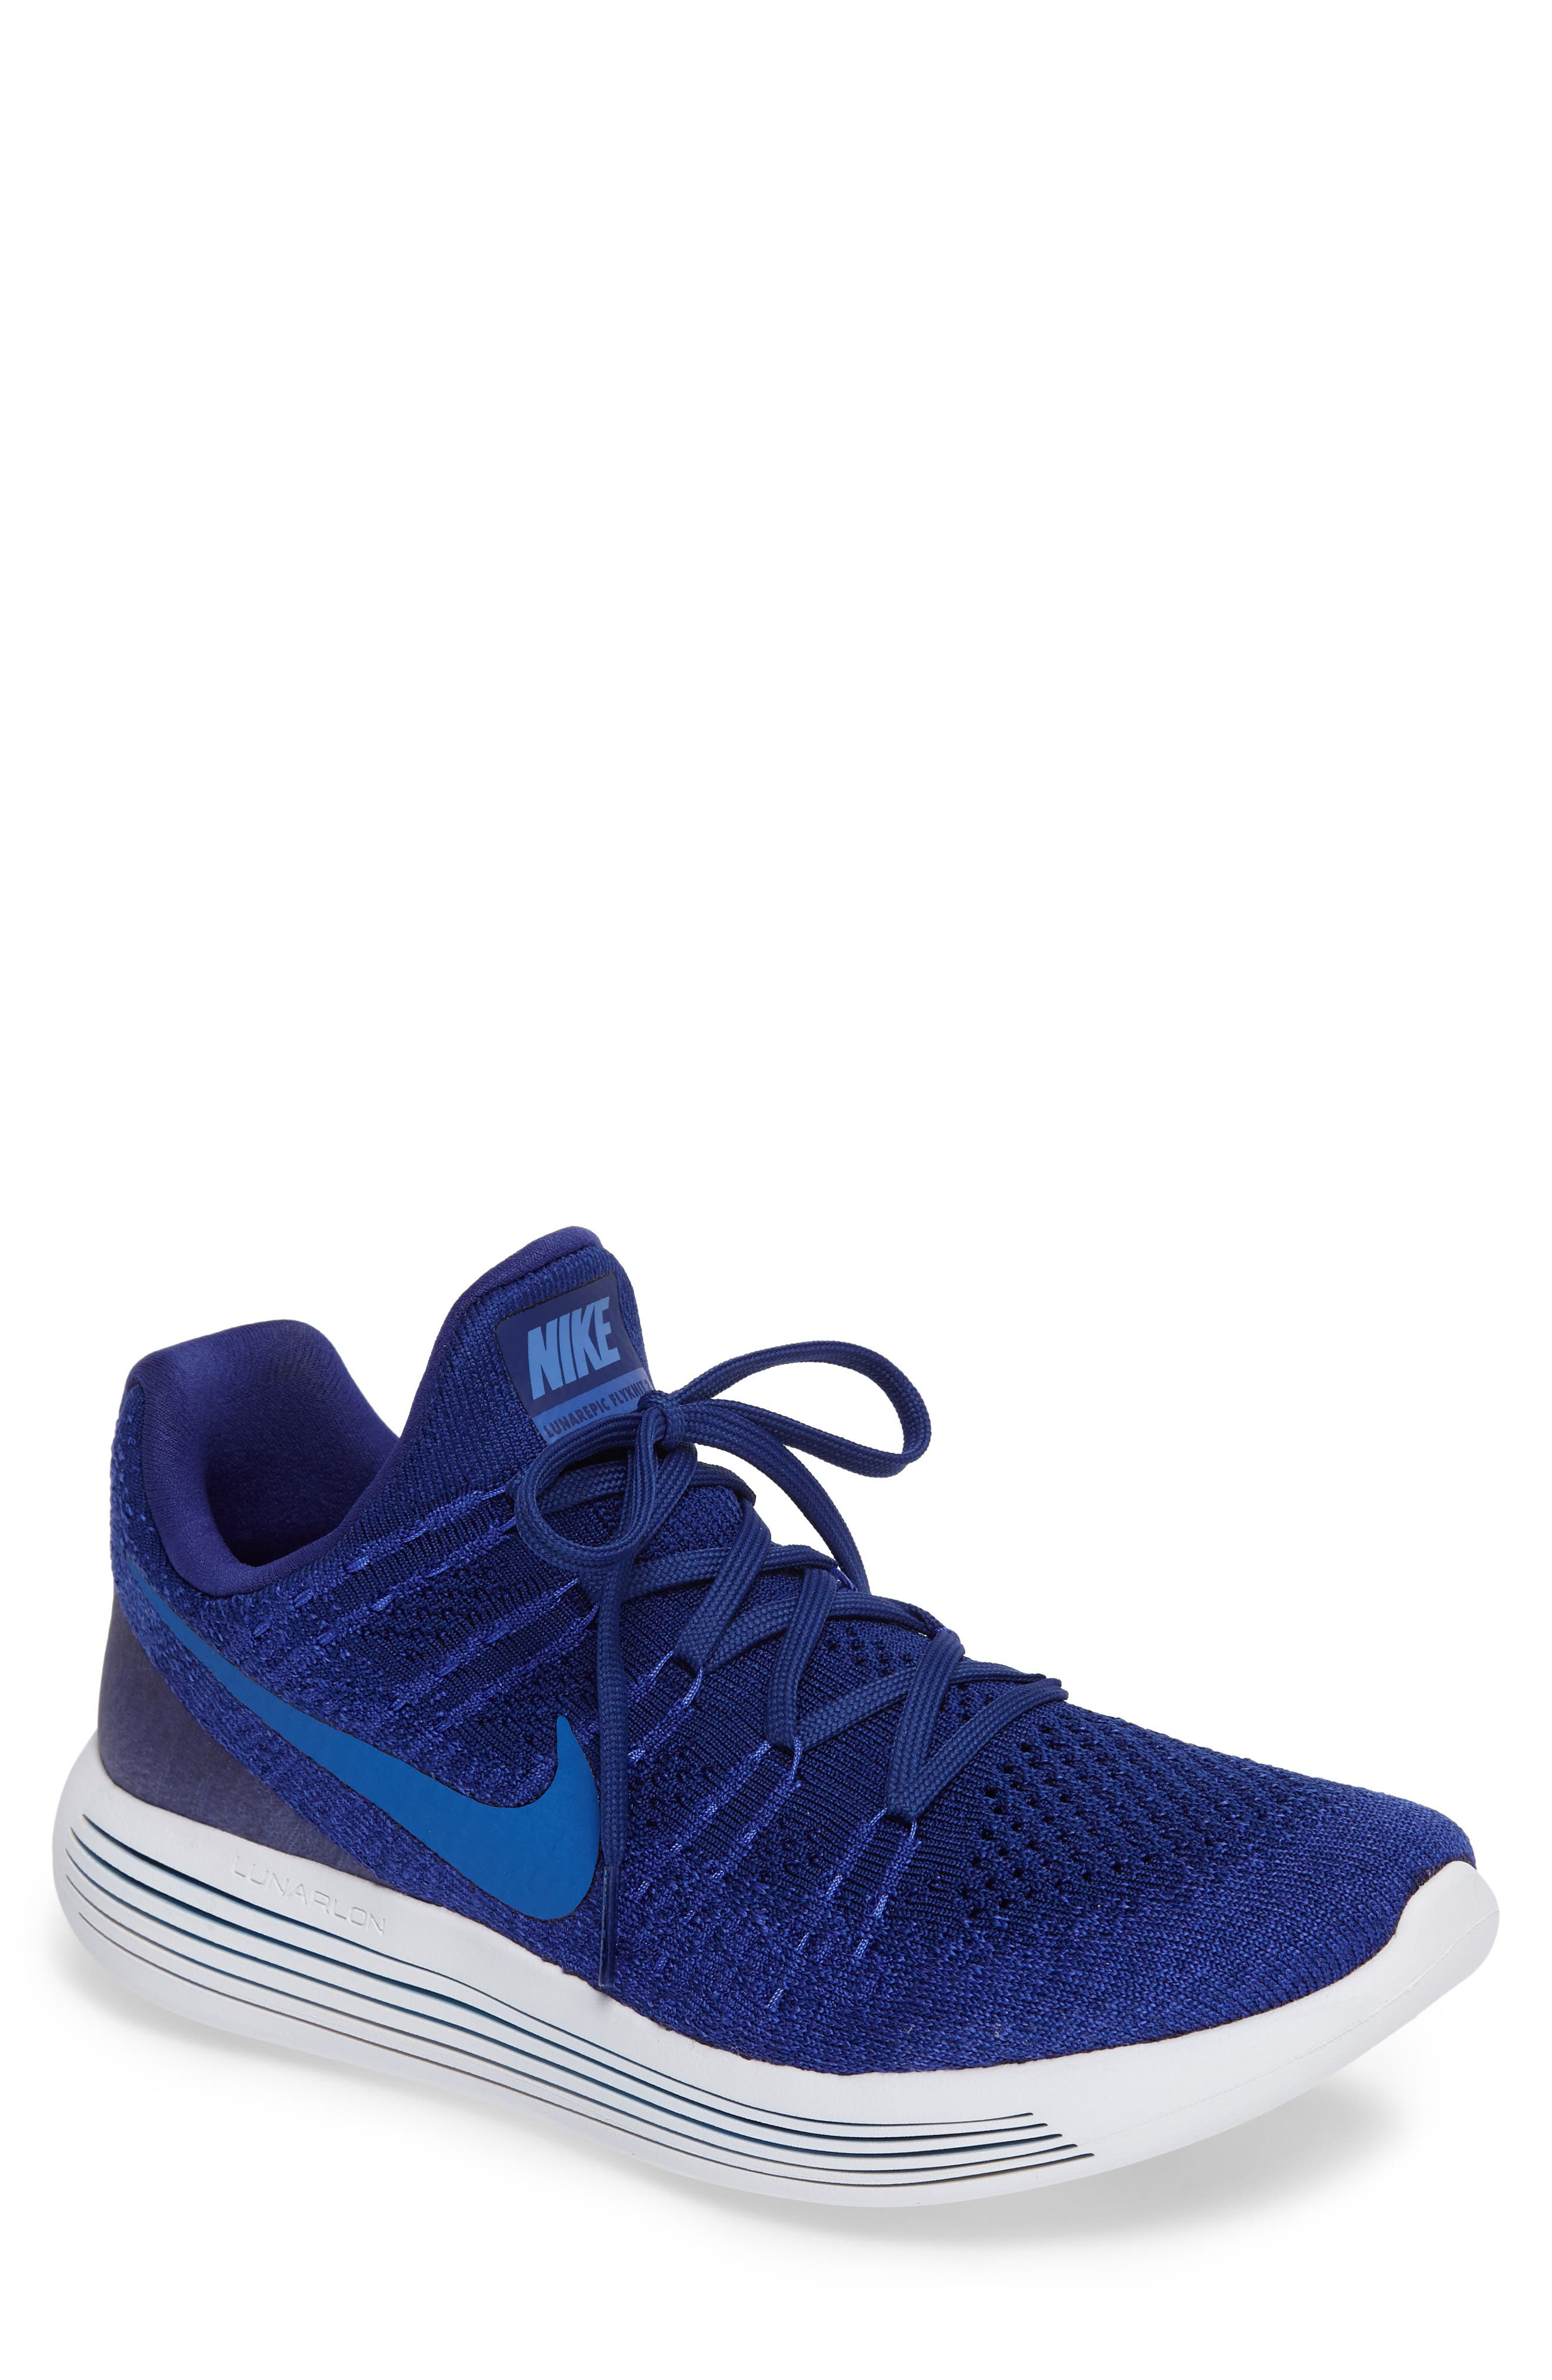 Alternate Image 1 Selected - Nike Flyknit 2 LunarEpic Running Shoe (Men)